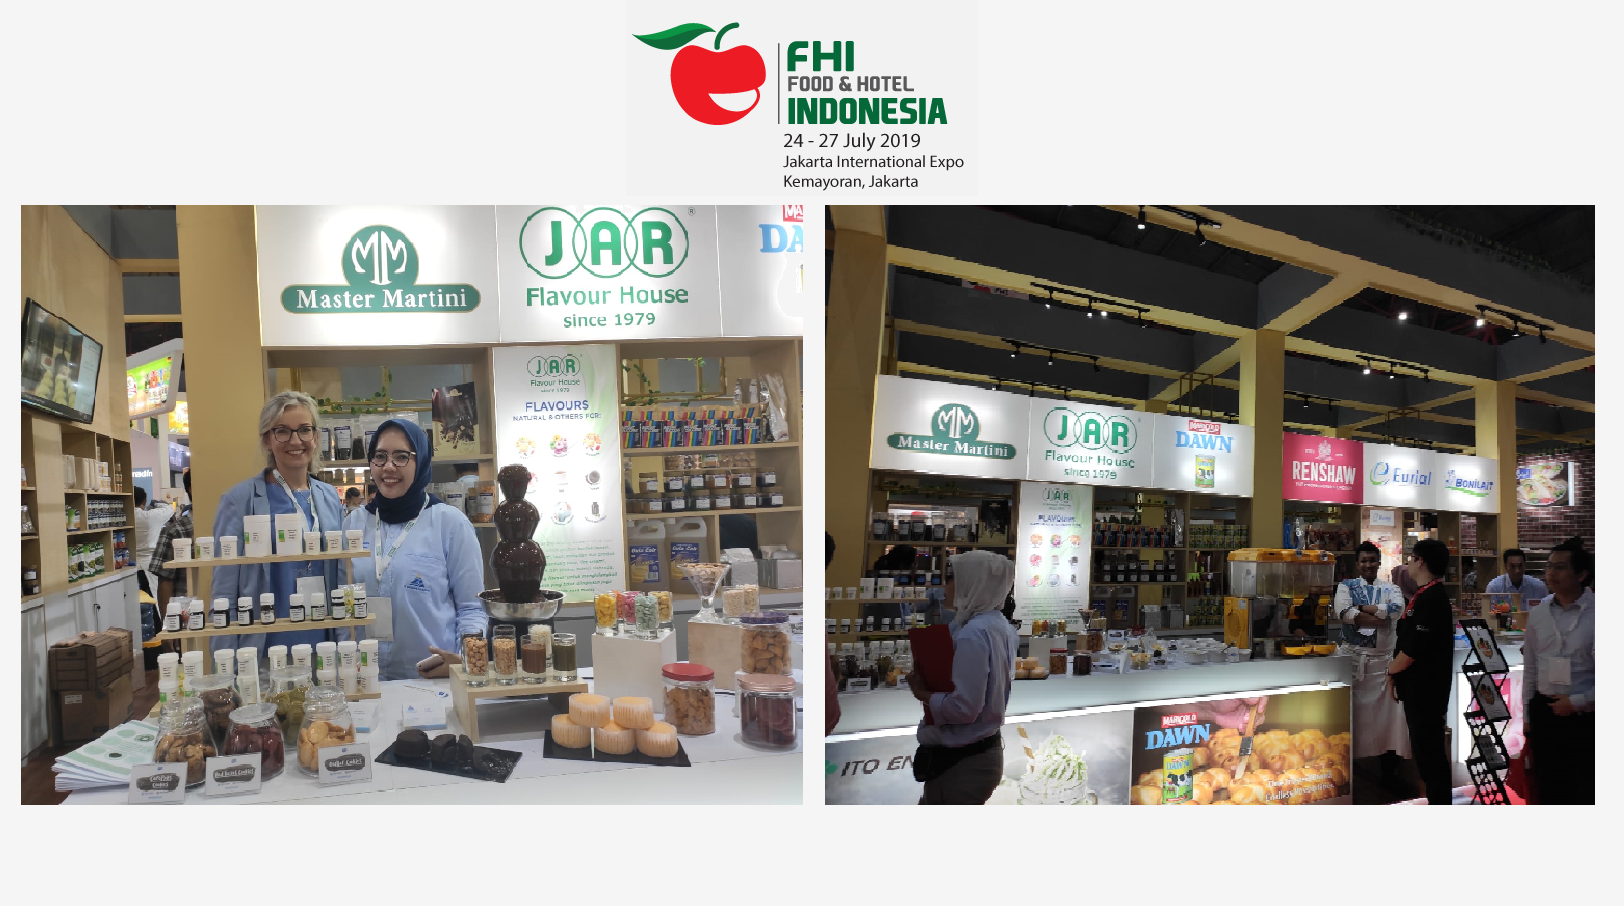 Jakarta, International EXPO, Indonesia 2019 - JAR Aromaty Flavour House